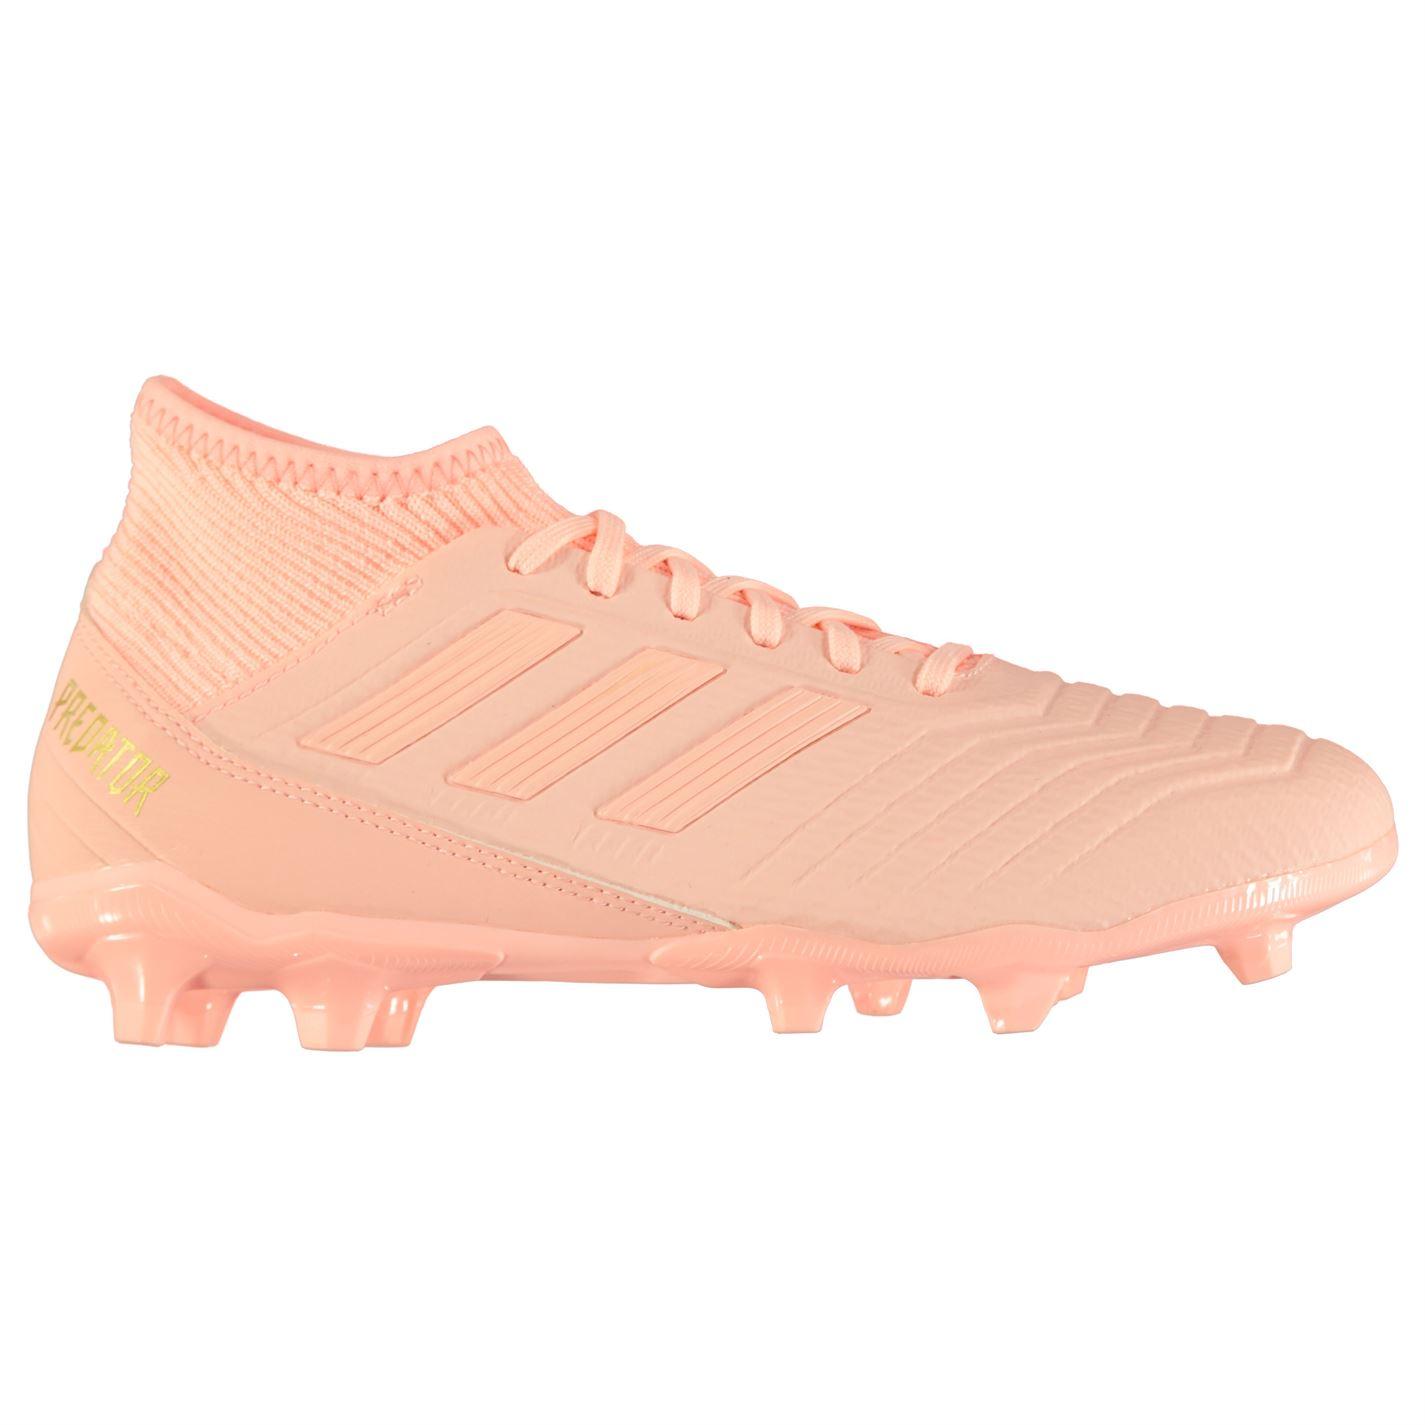 c61cab1fb Fotbalové kopačky adidas Predator 18.3 Mens FG Football Boots. Fotbalové  kopačky adidas Predator 18.3 Mens FG Football Boots